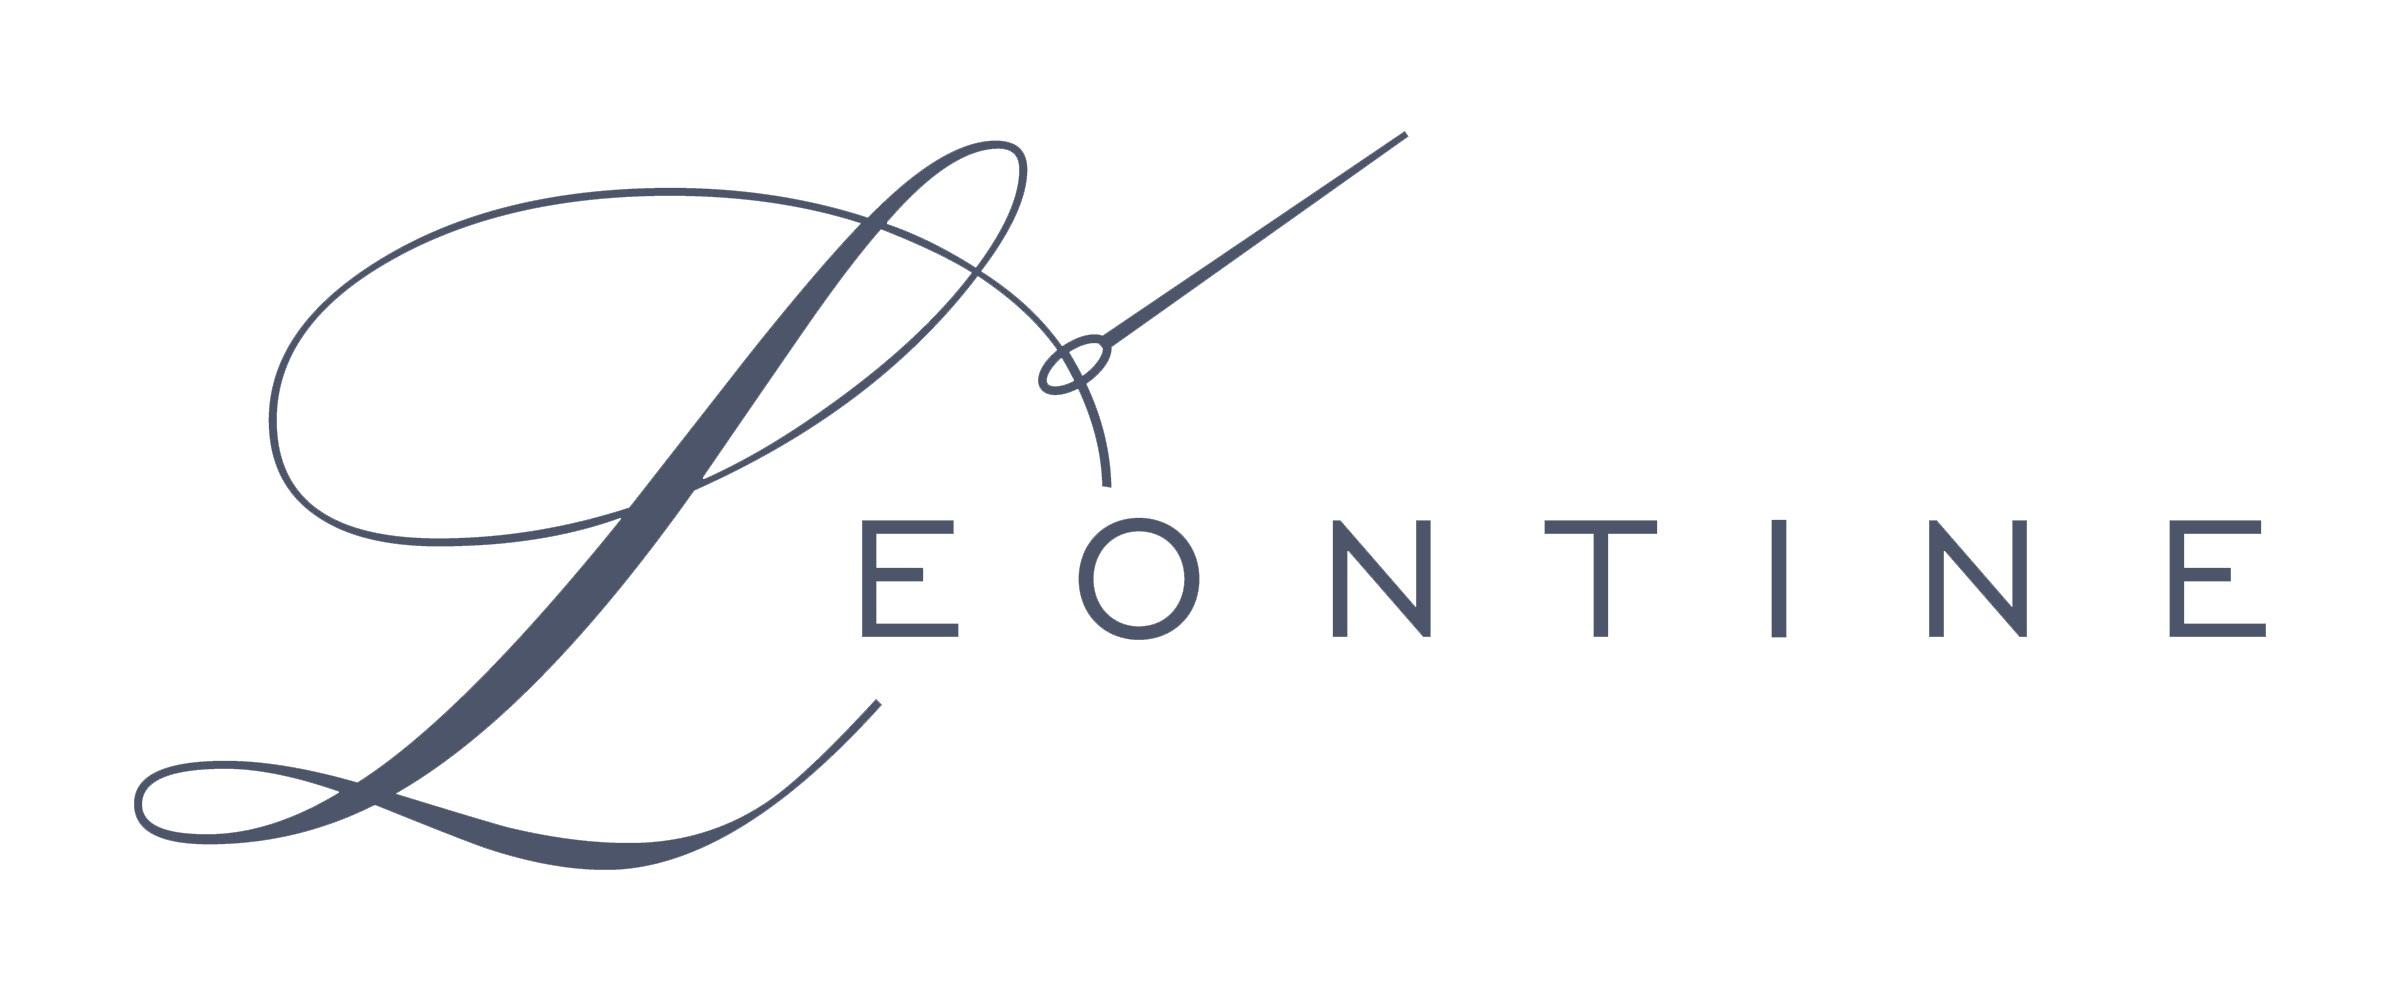 Leontine Linens logo